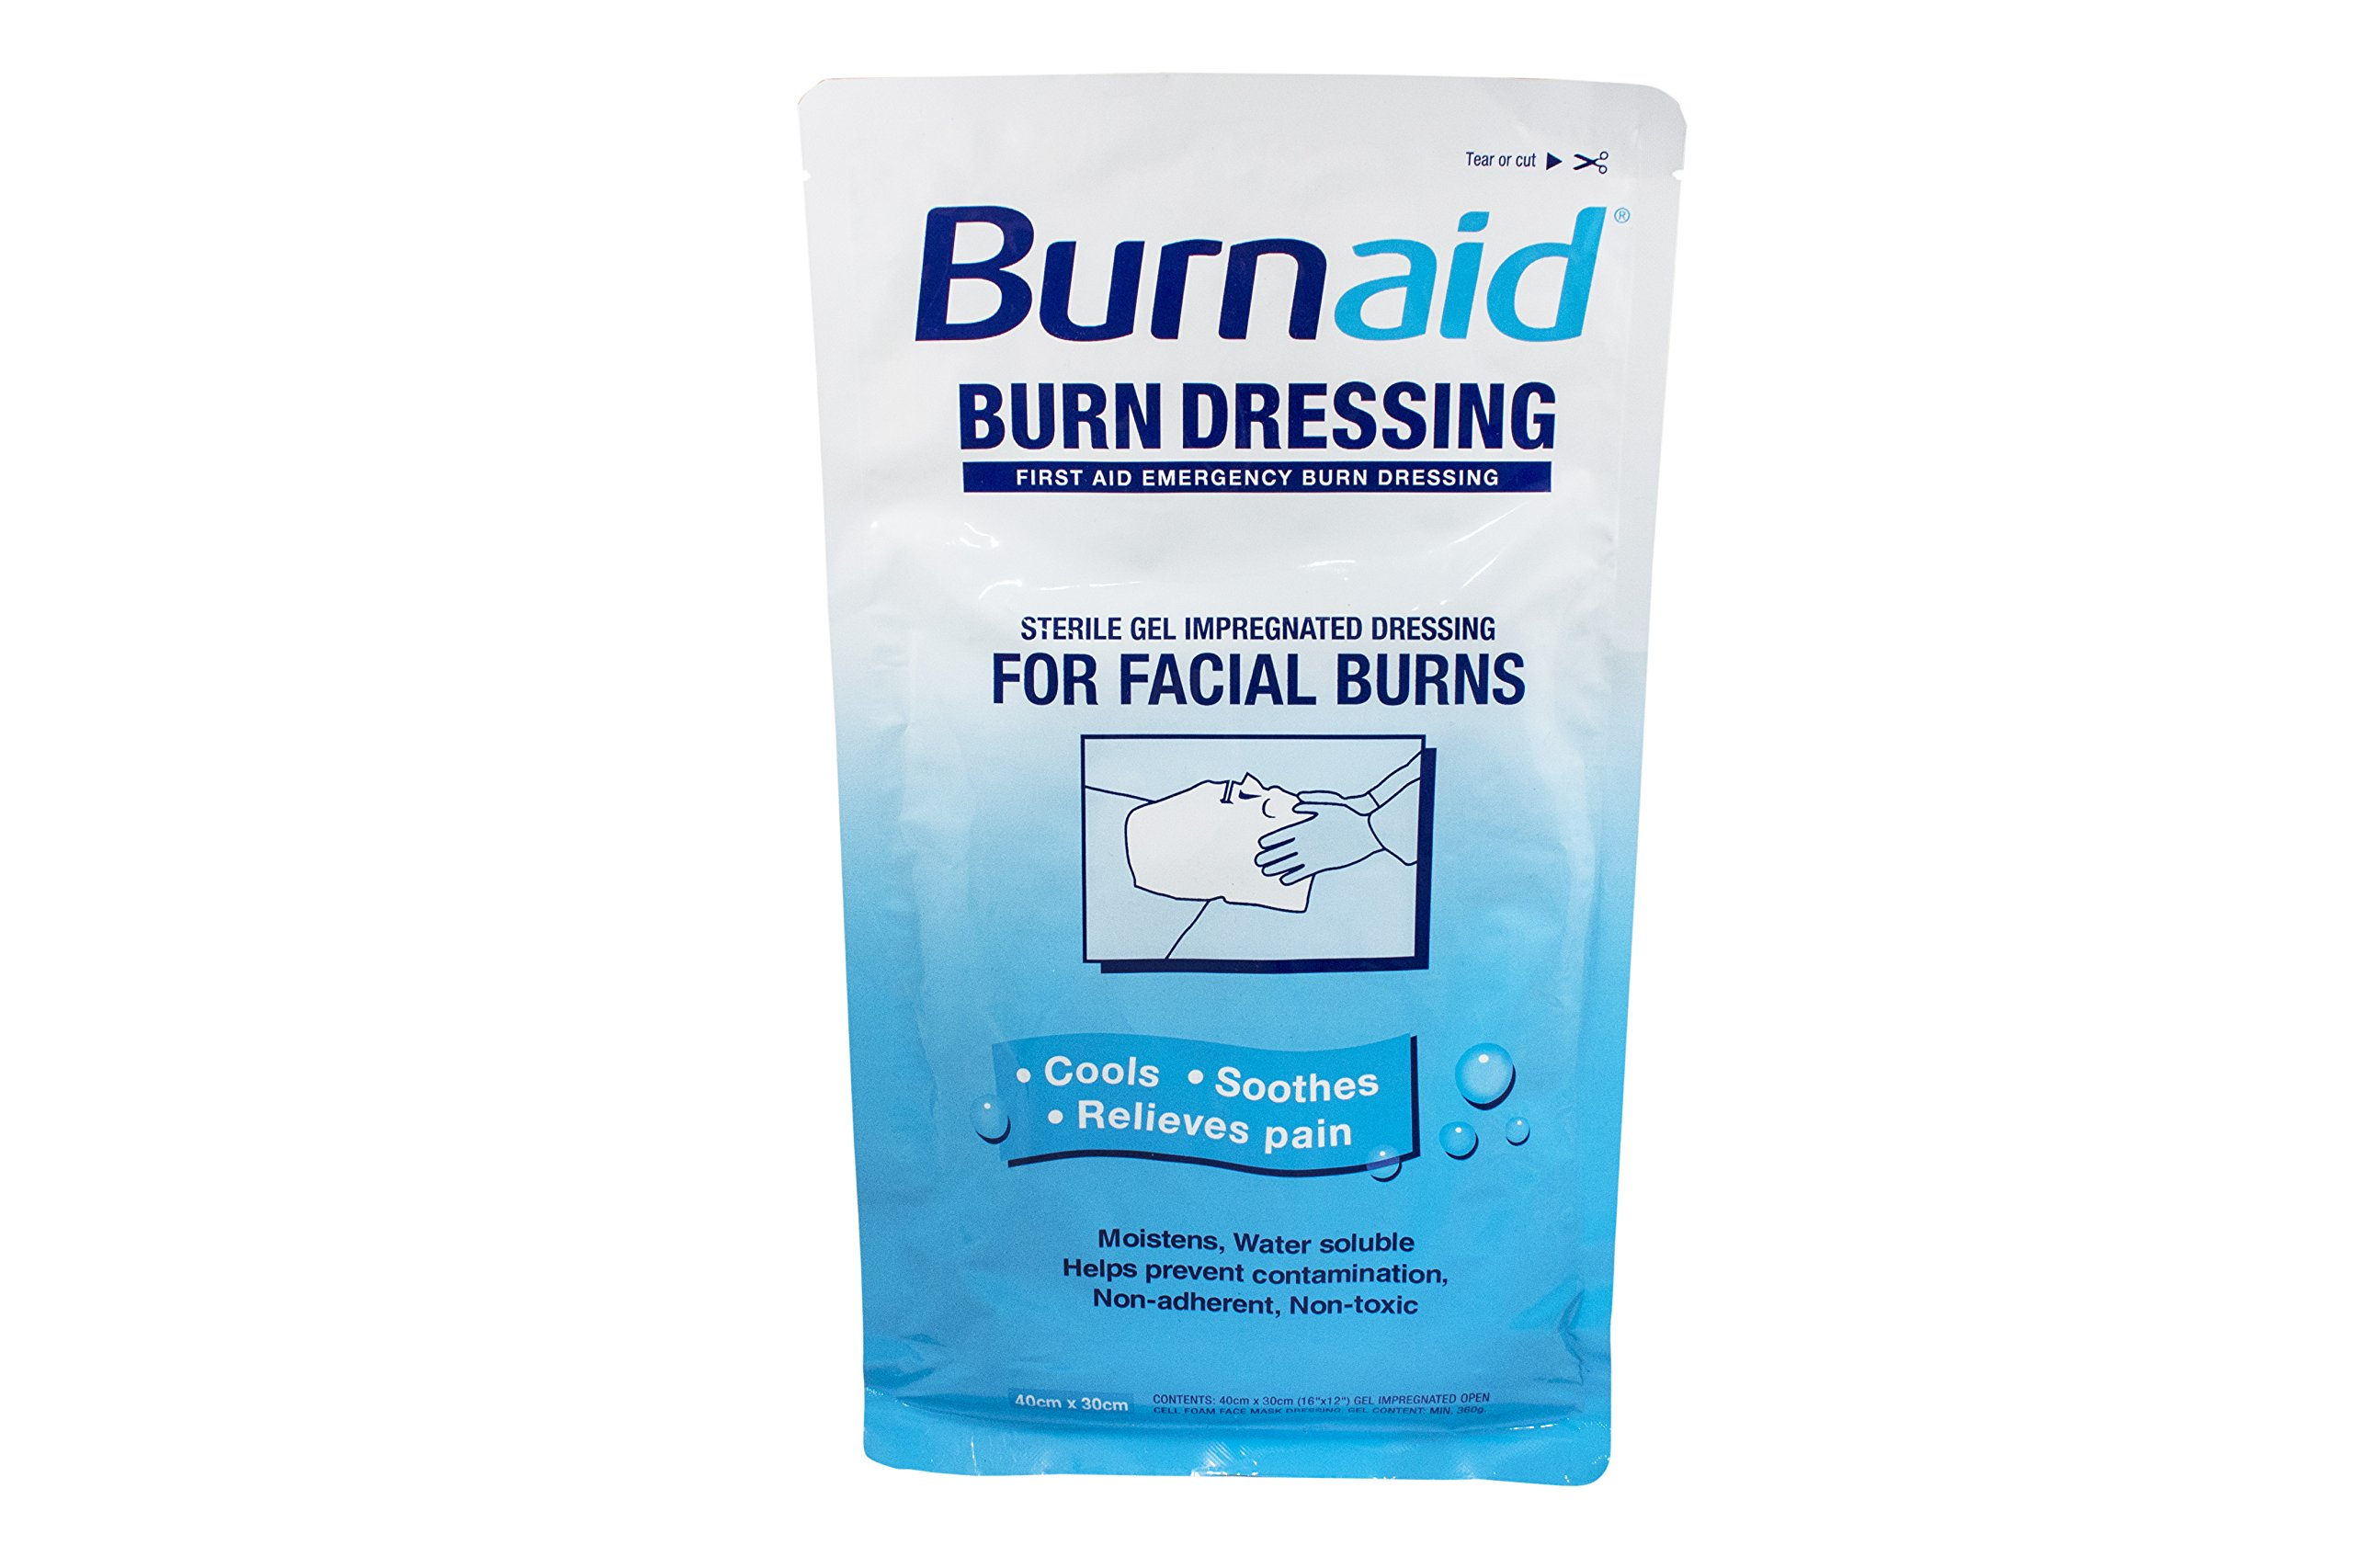 Dukal BBD-1 Burn Aid, Dressing, Sterile, 1.2 m x 2 m